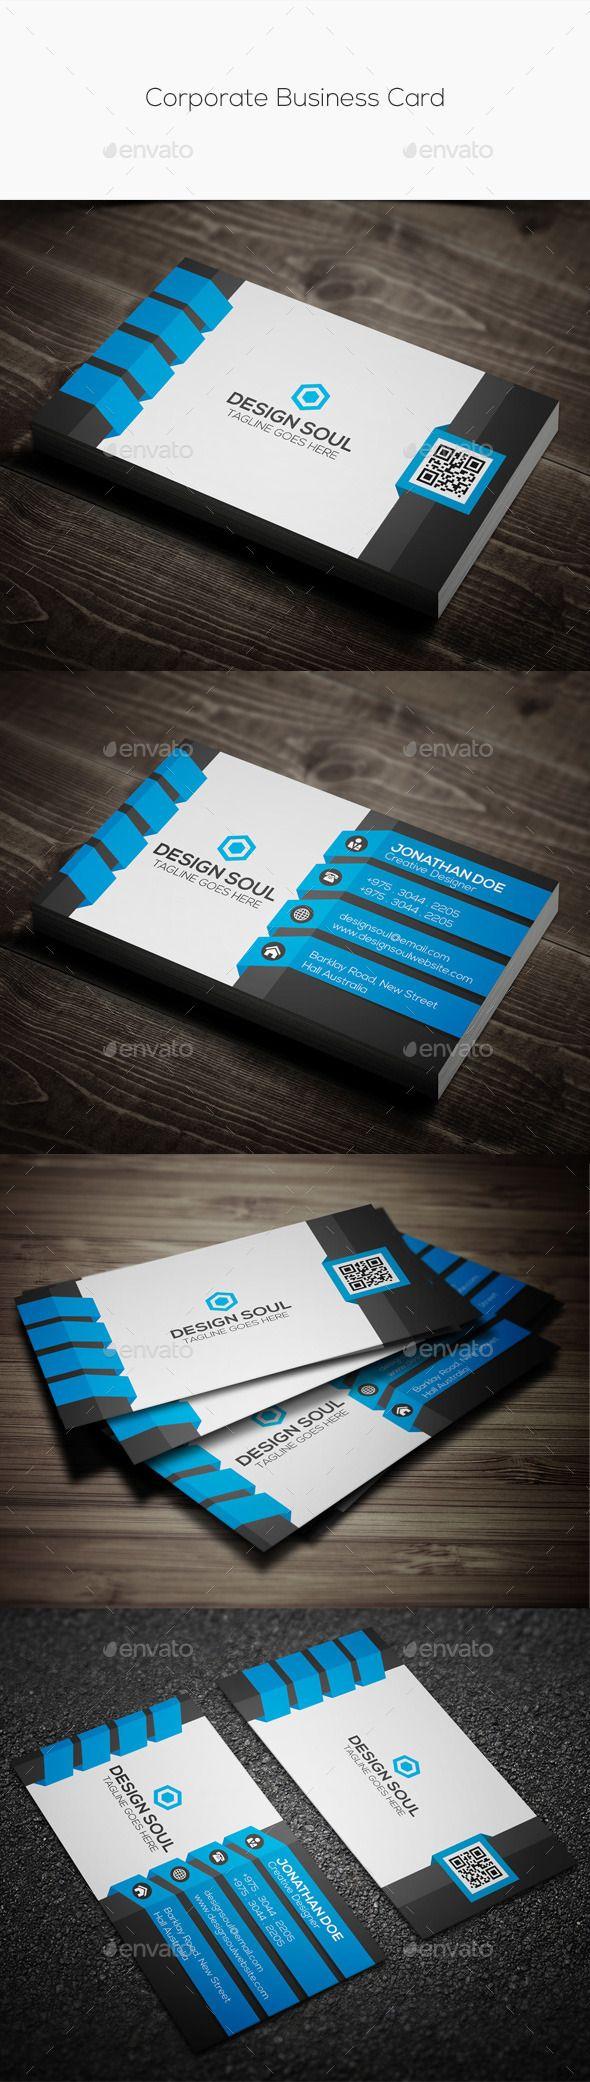 Corporate business card cartes de visita visita e carto corporate business card template design download reheart Images